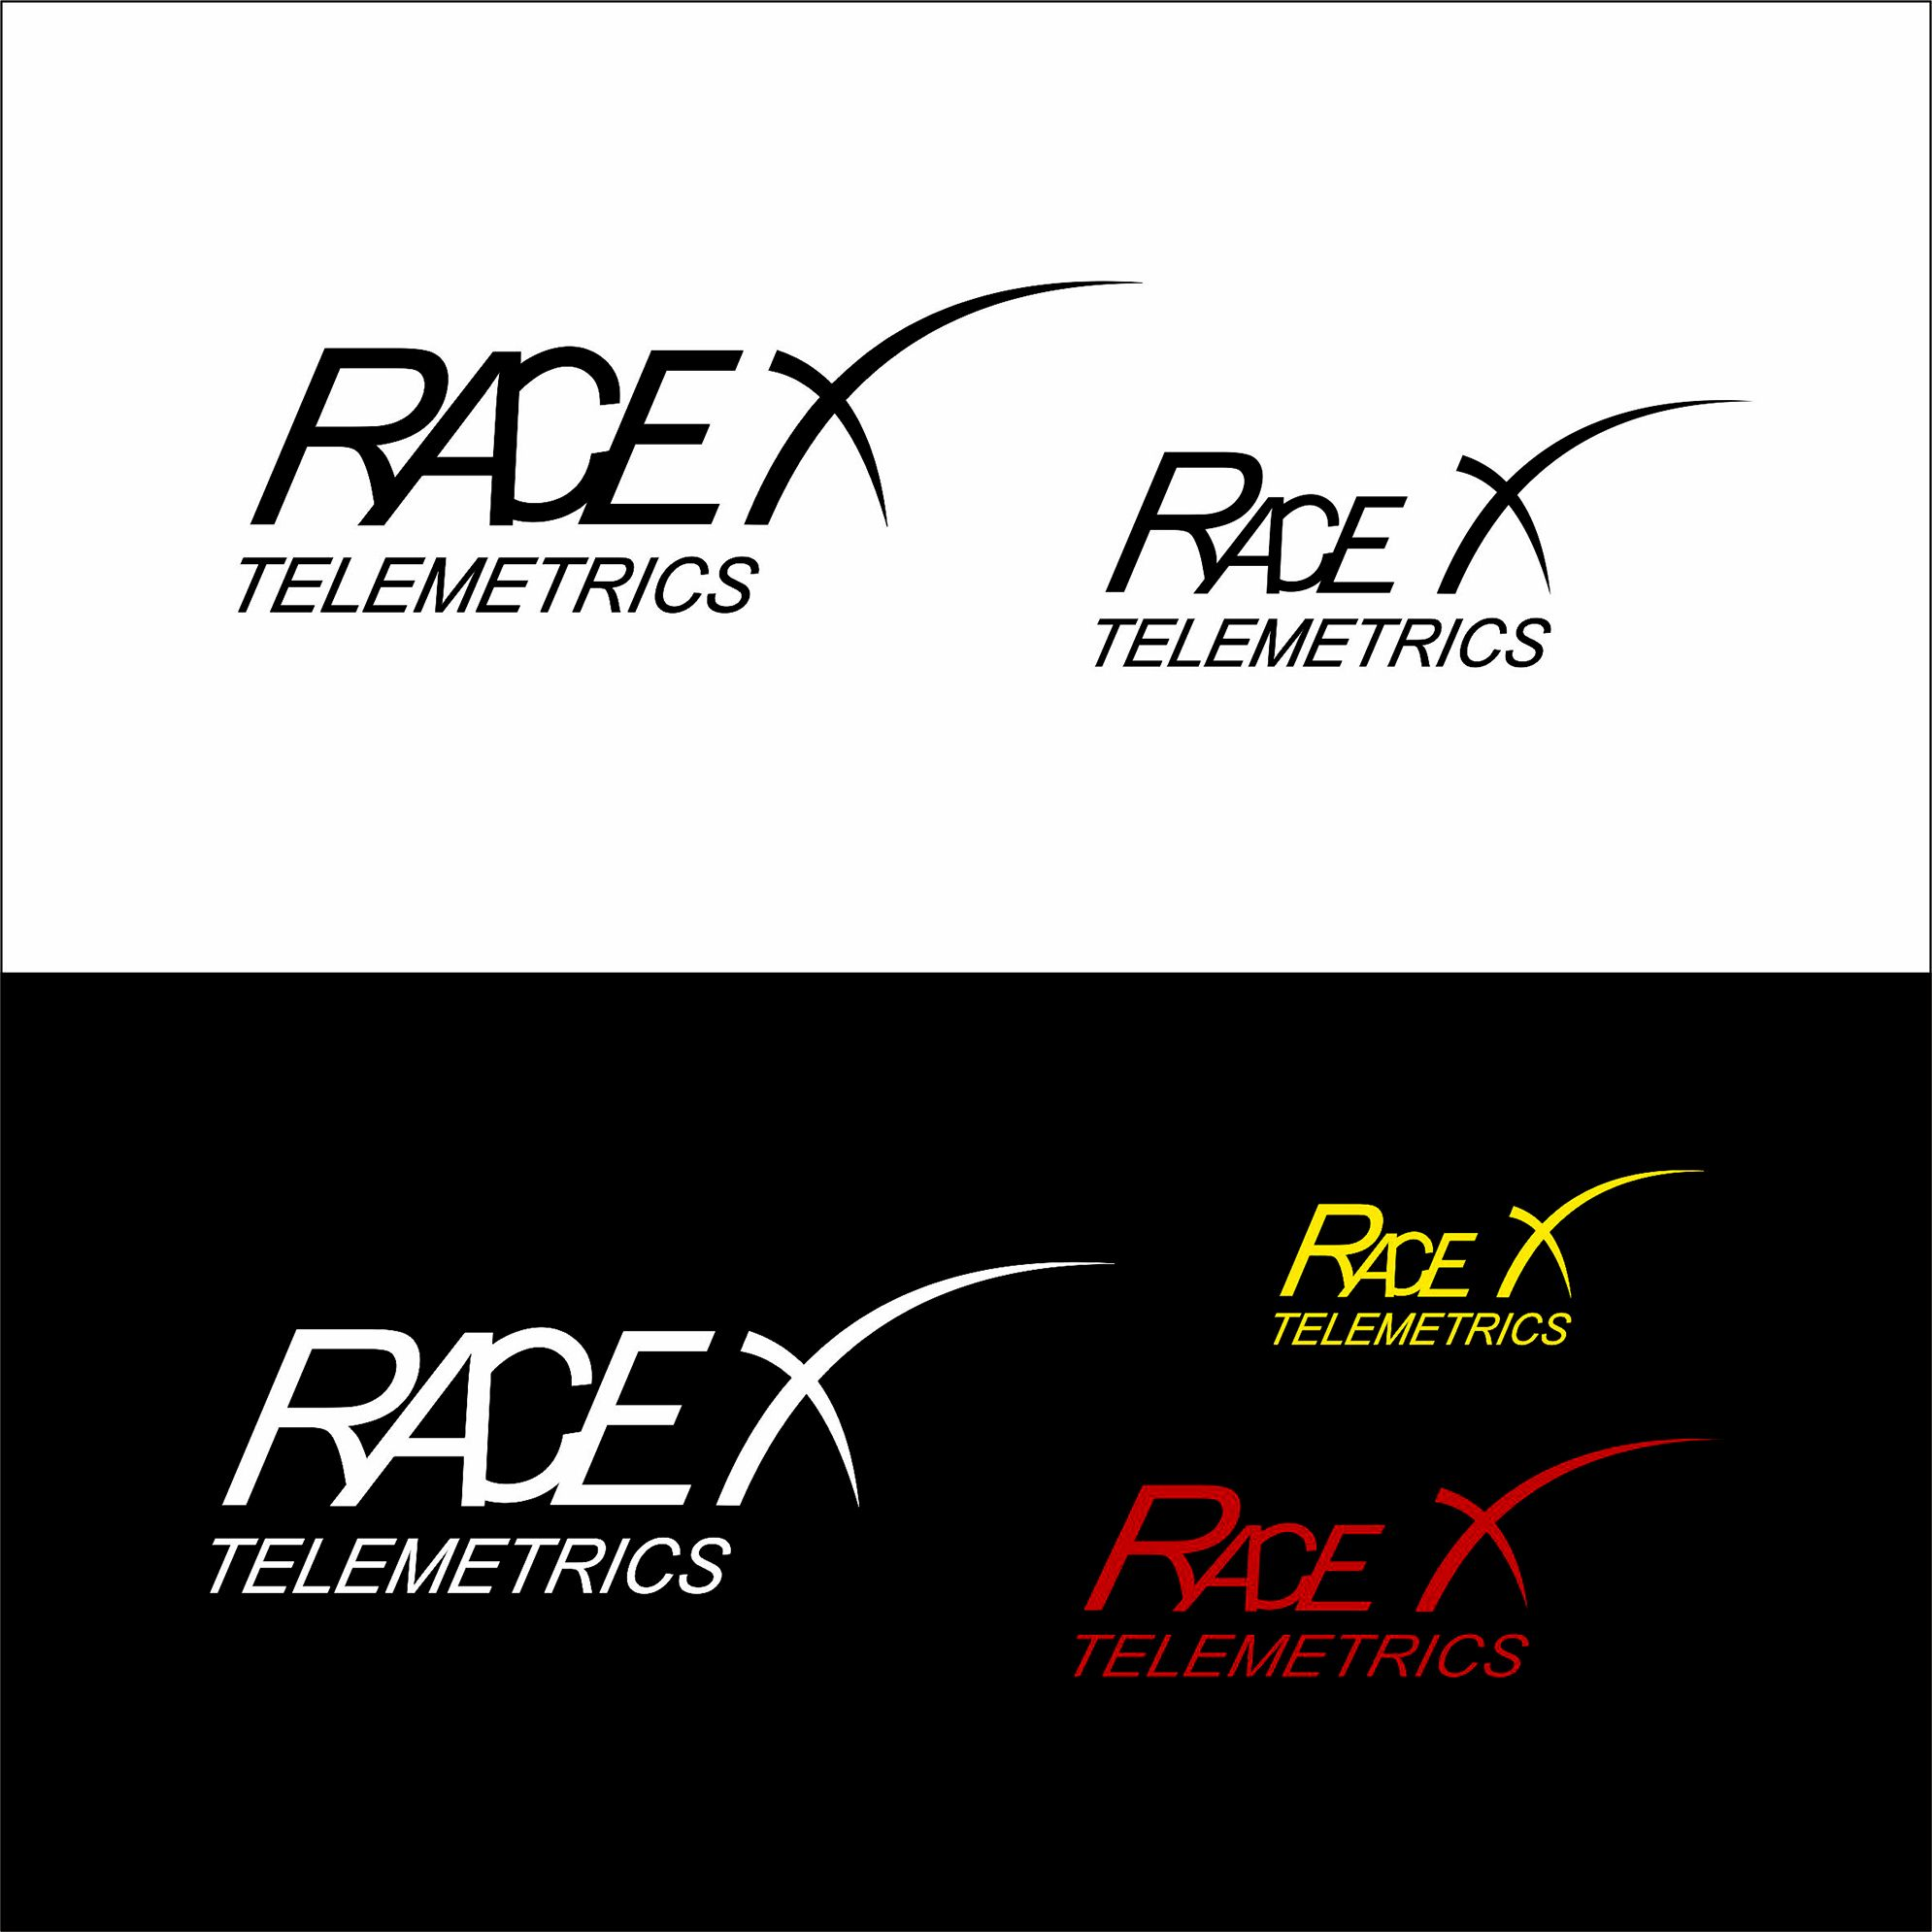 Логотип RaceX Telemetrics  - дизайнер AlexZab